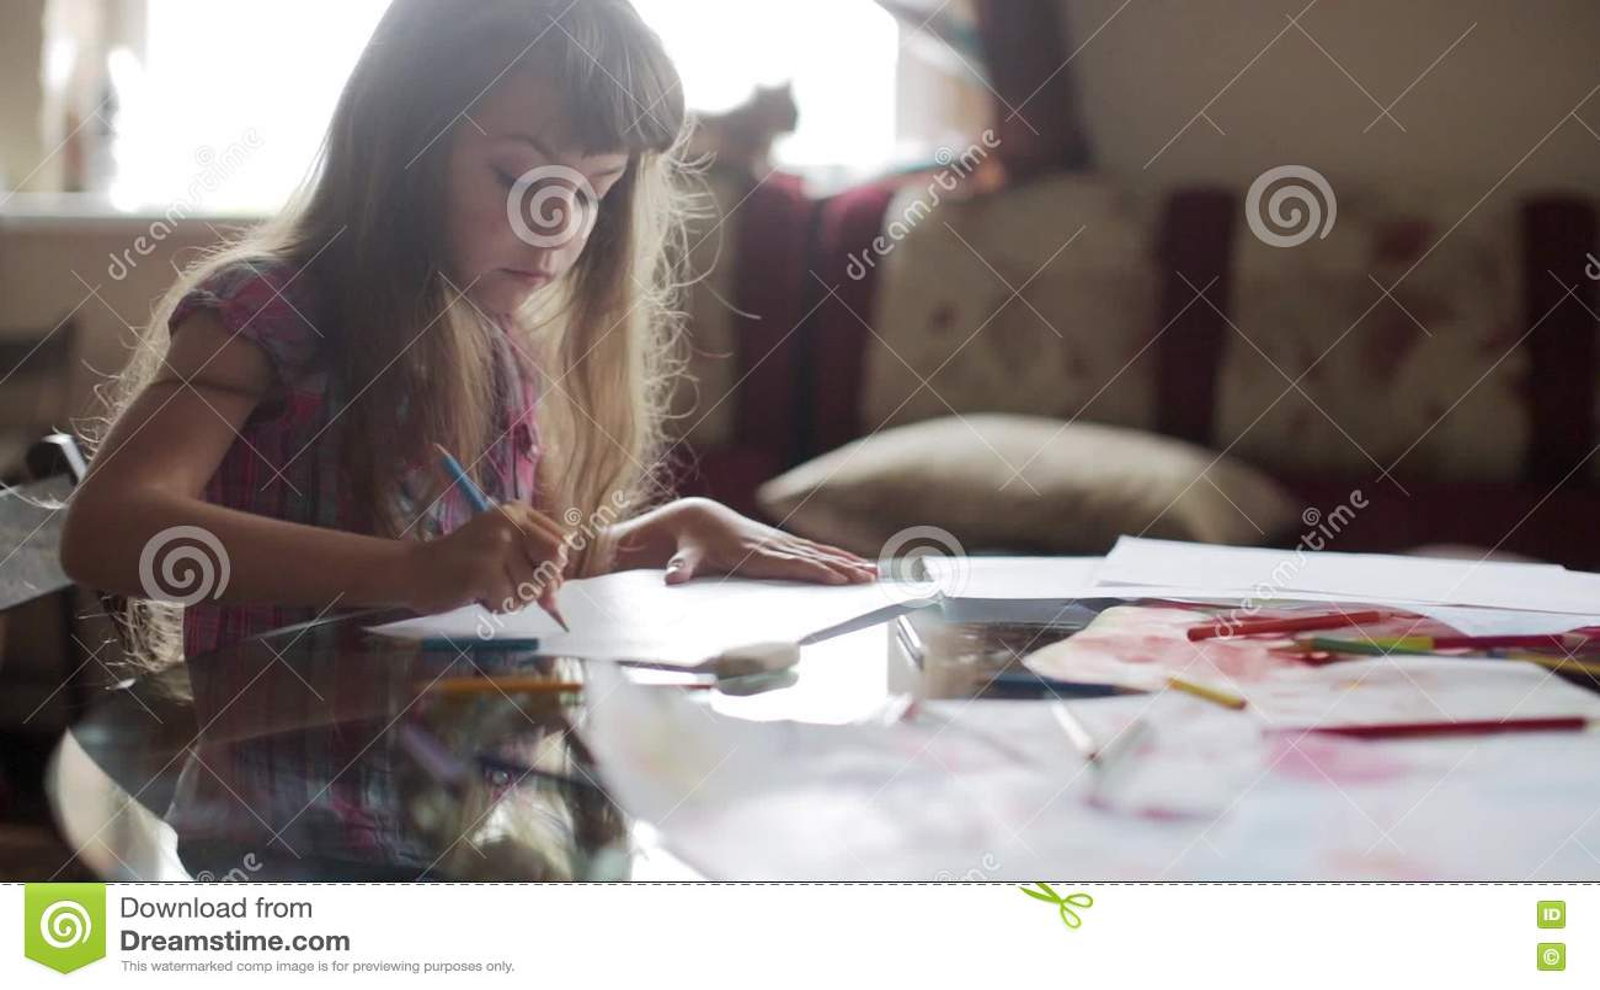 подошли фото девушка рисует член палатке